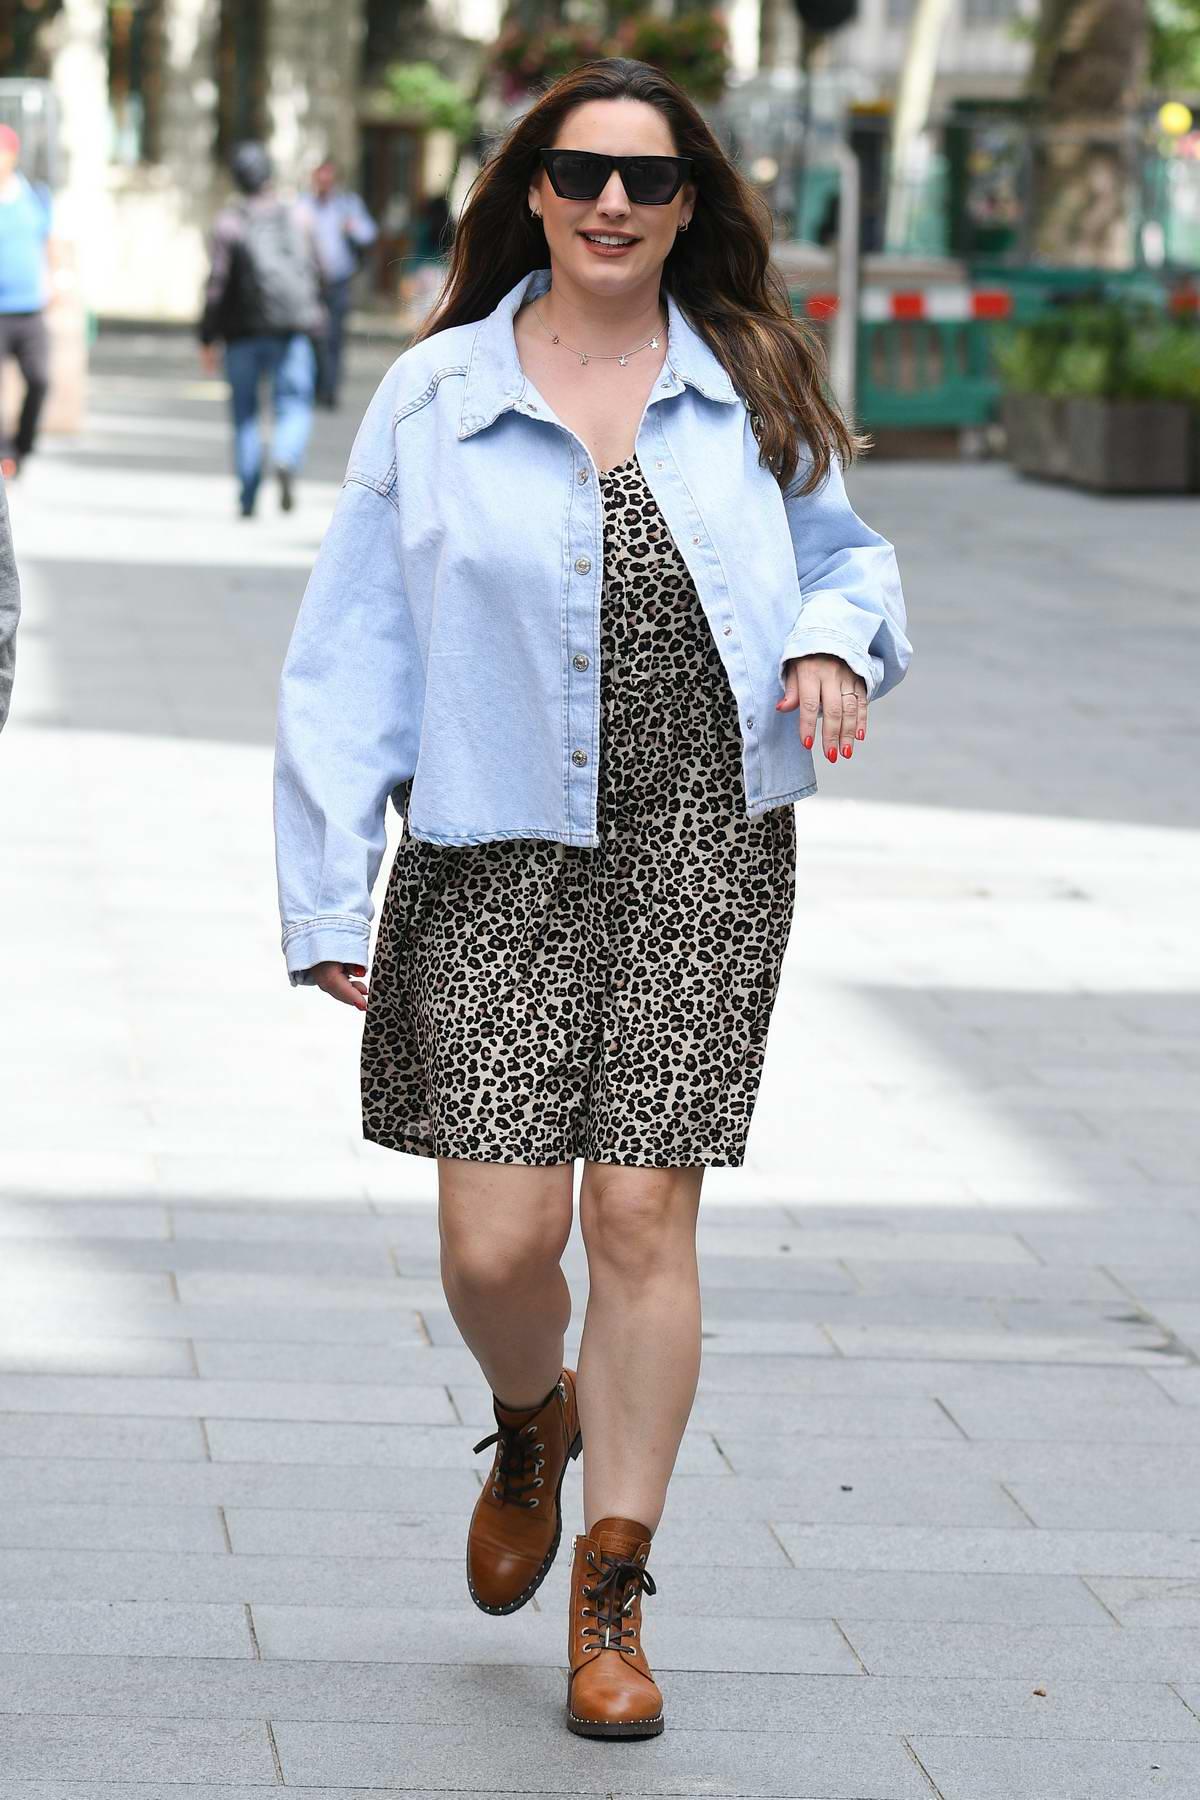 Kelly Brook wears an animal print as she arrives at the Global Radio Studios in London, UK